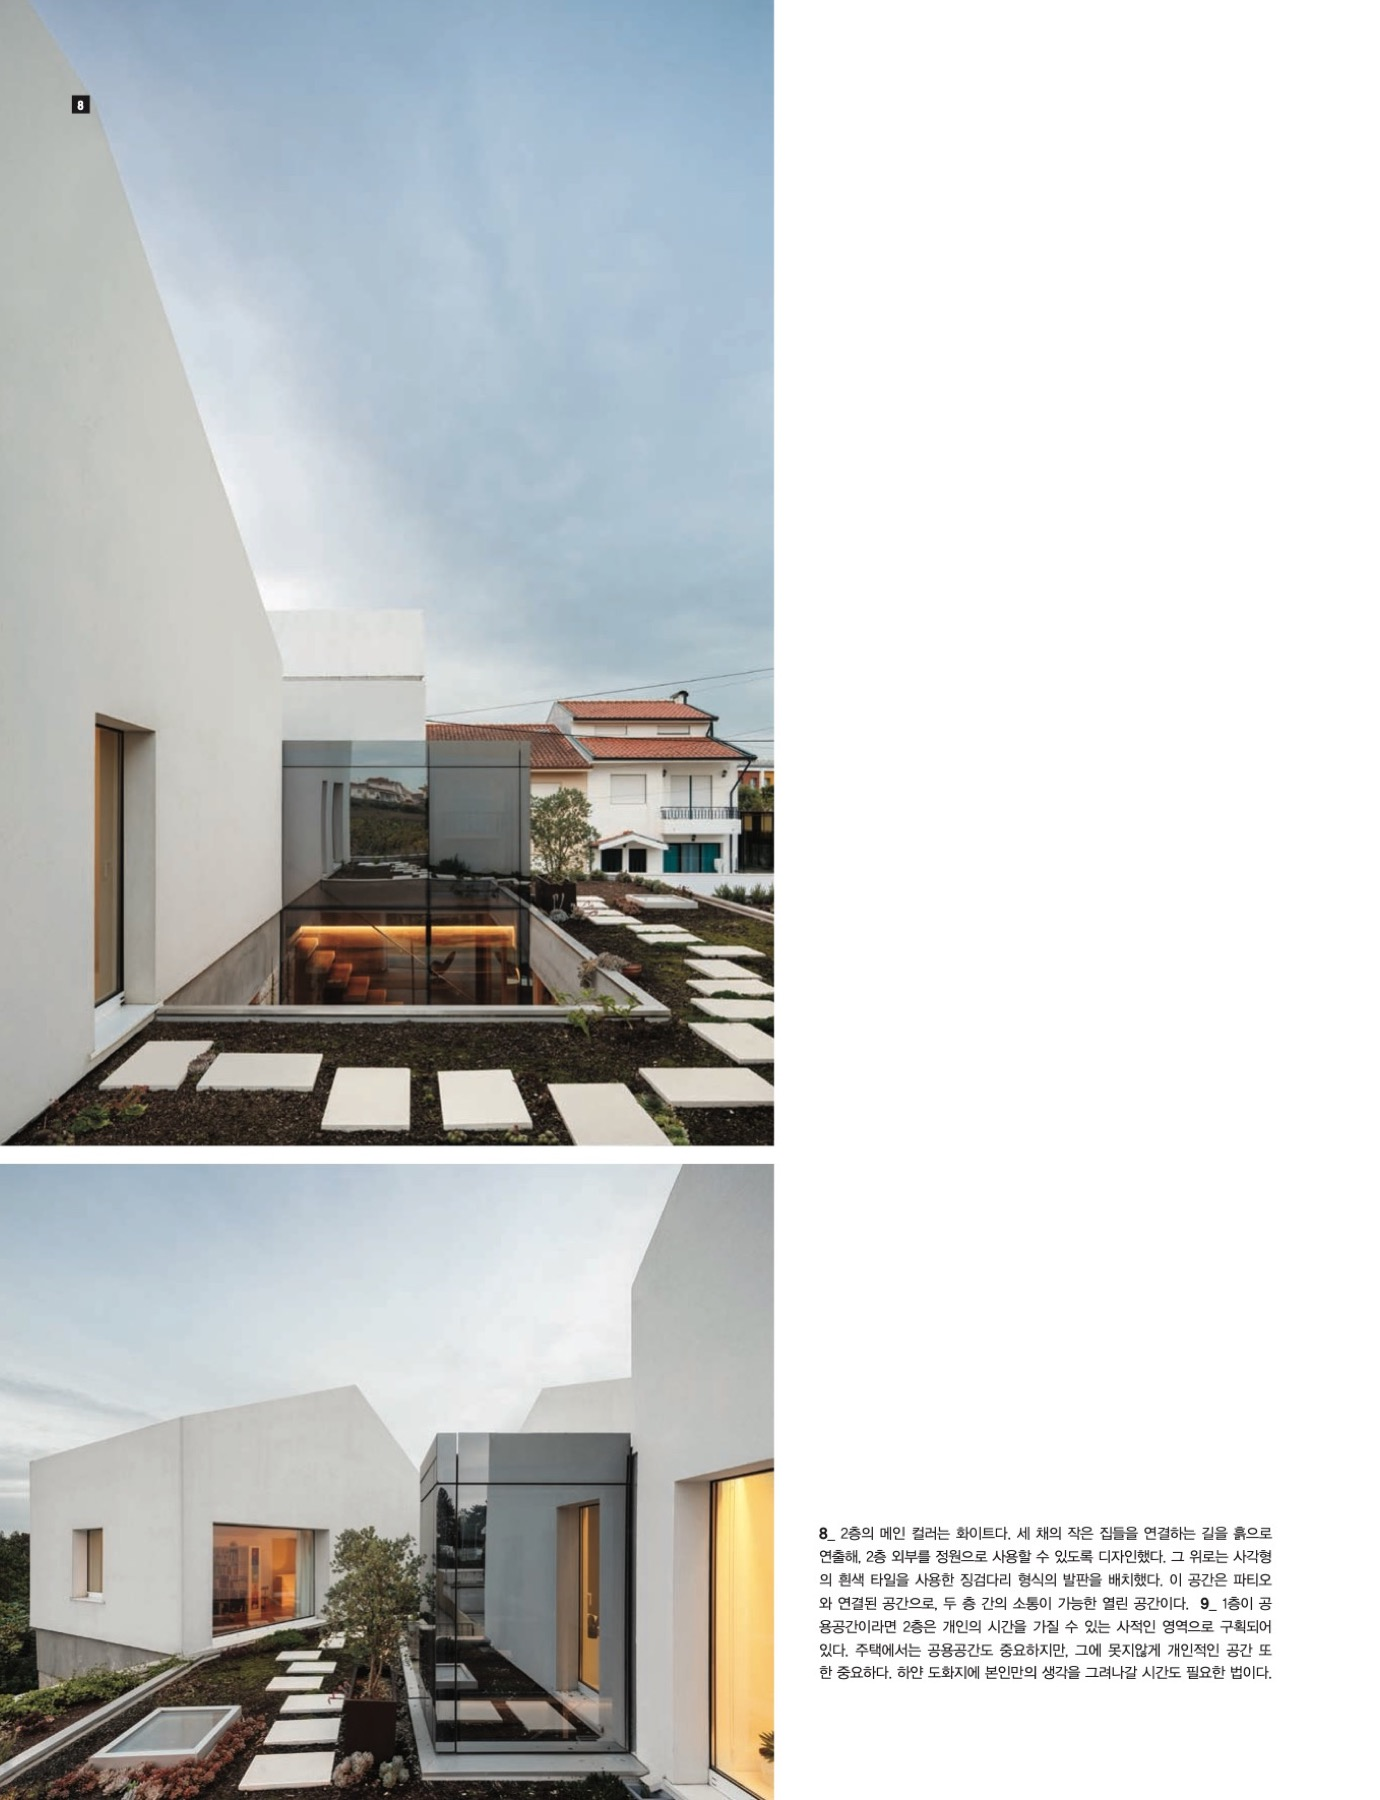 INTERIORS KOREA 414 casa rio paulo merlini ivo tavares studio 13 14